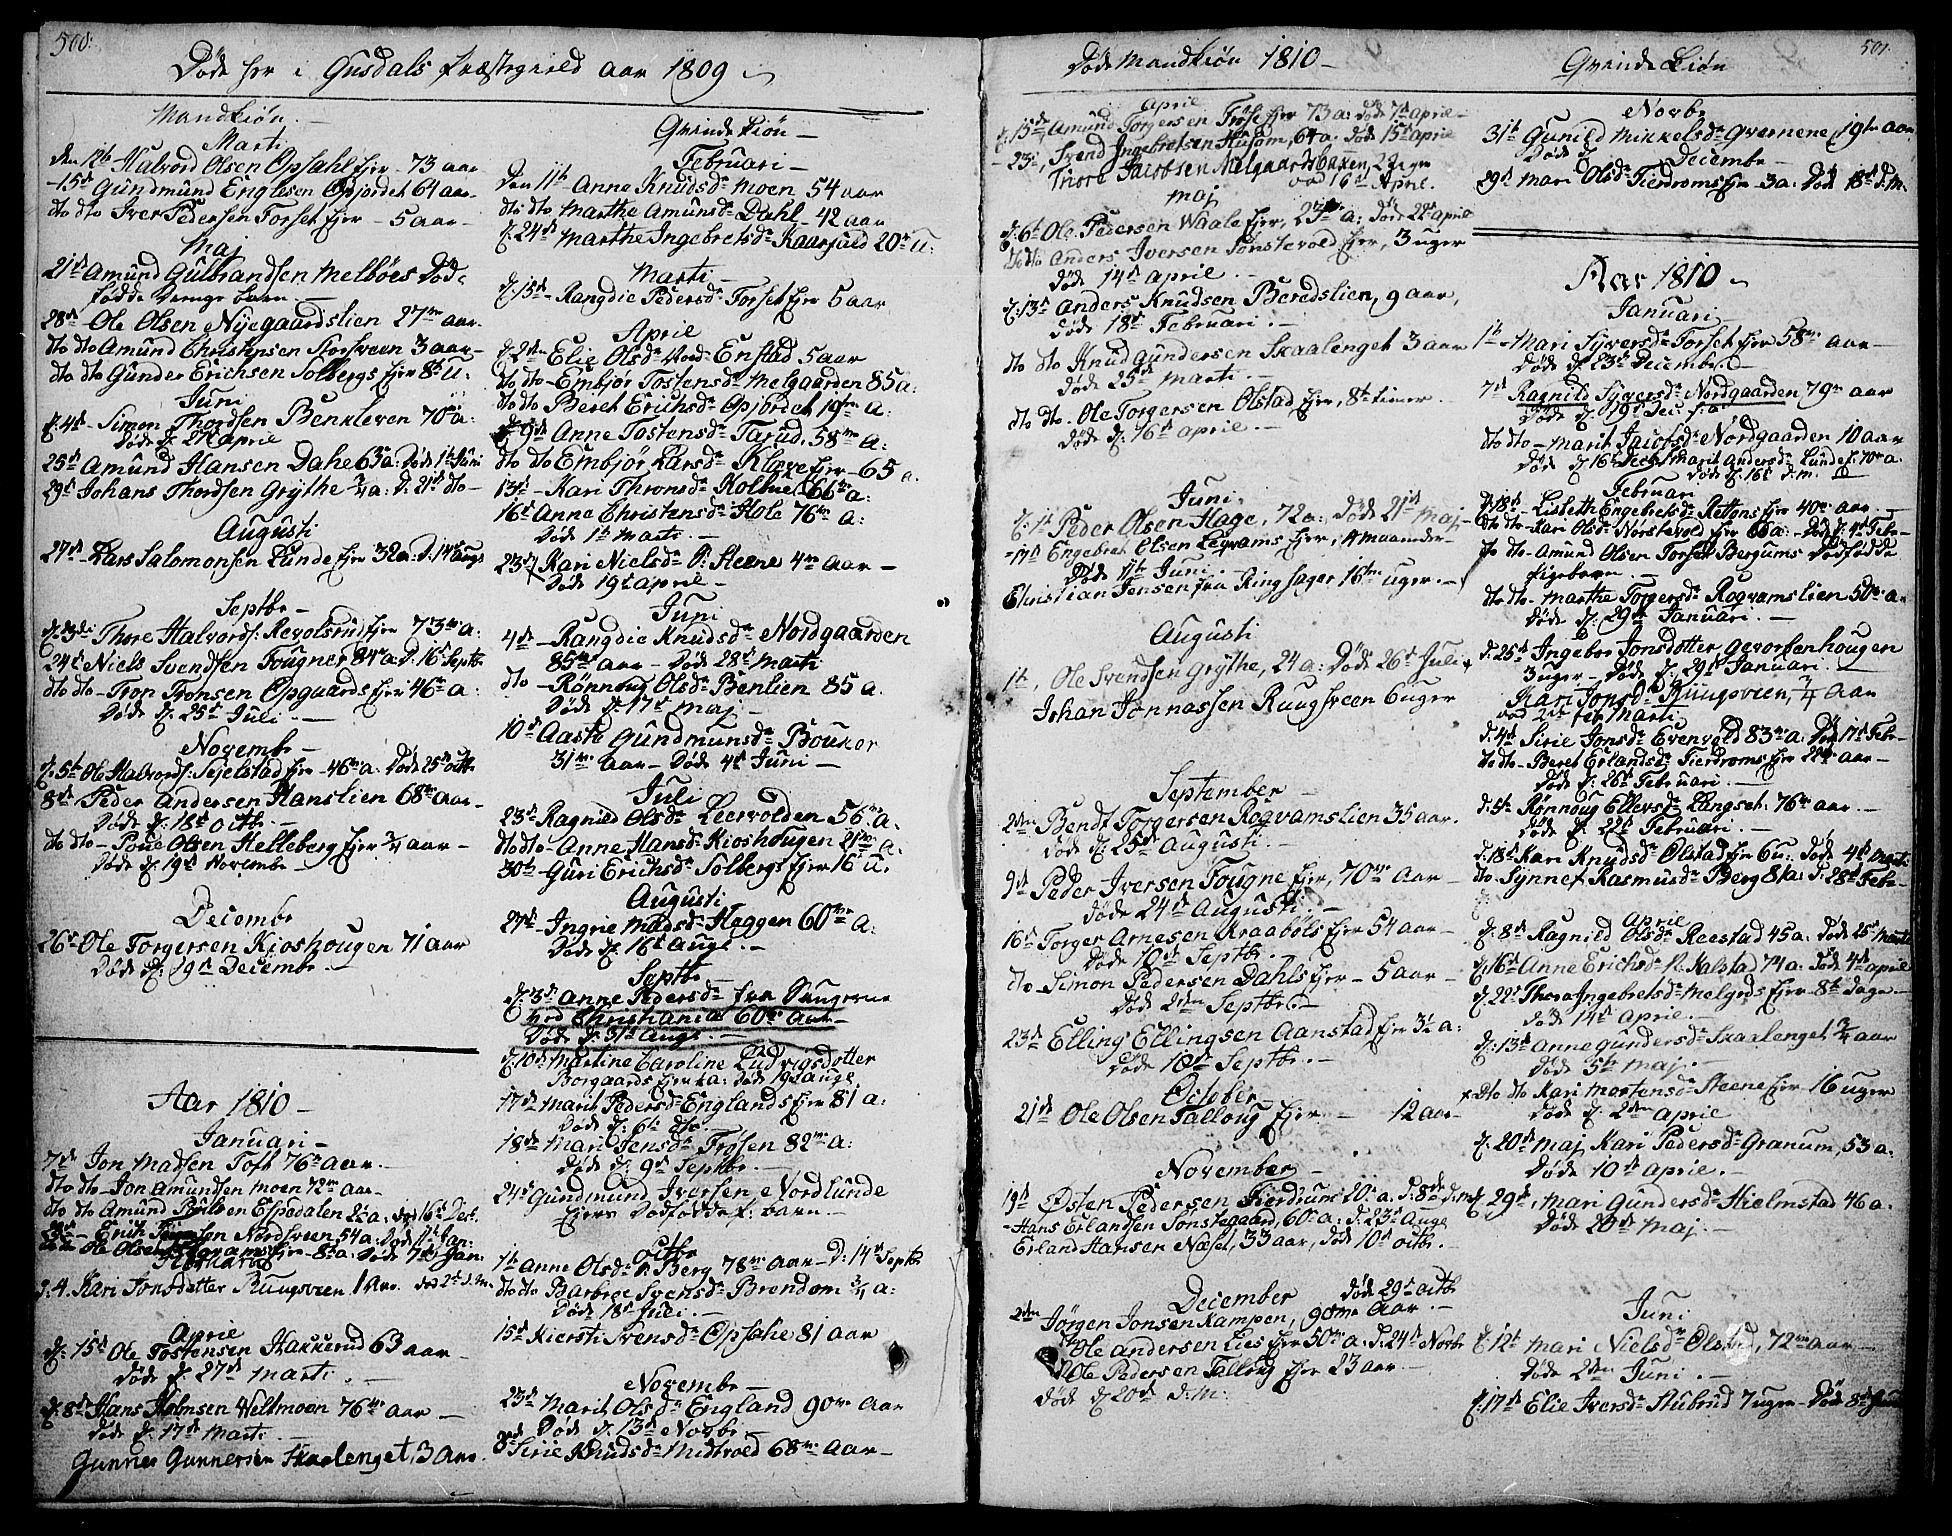 SAH, Gausdal prestekontor, Ministerialbok nr. 4, 1809-1817, s. 500-501